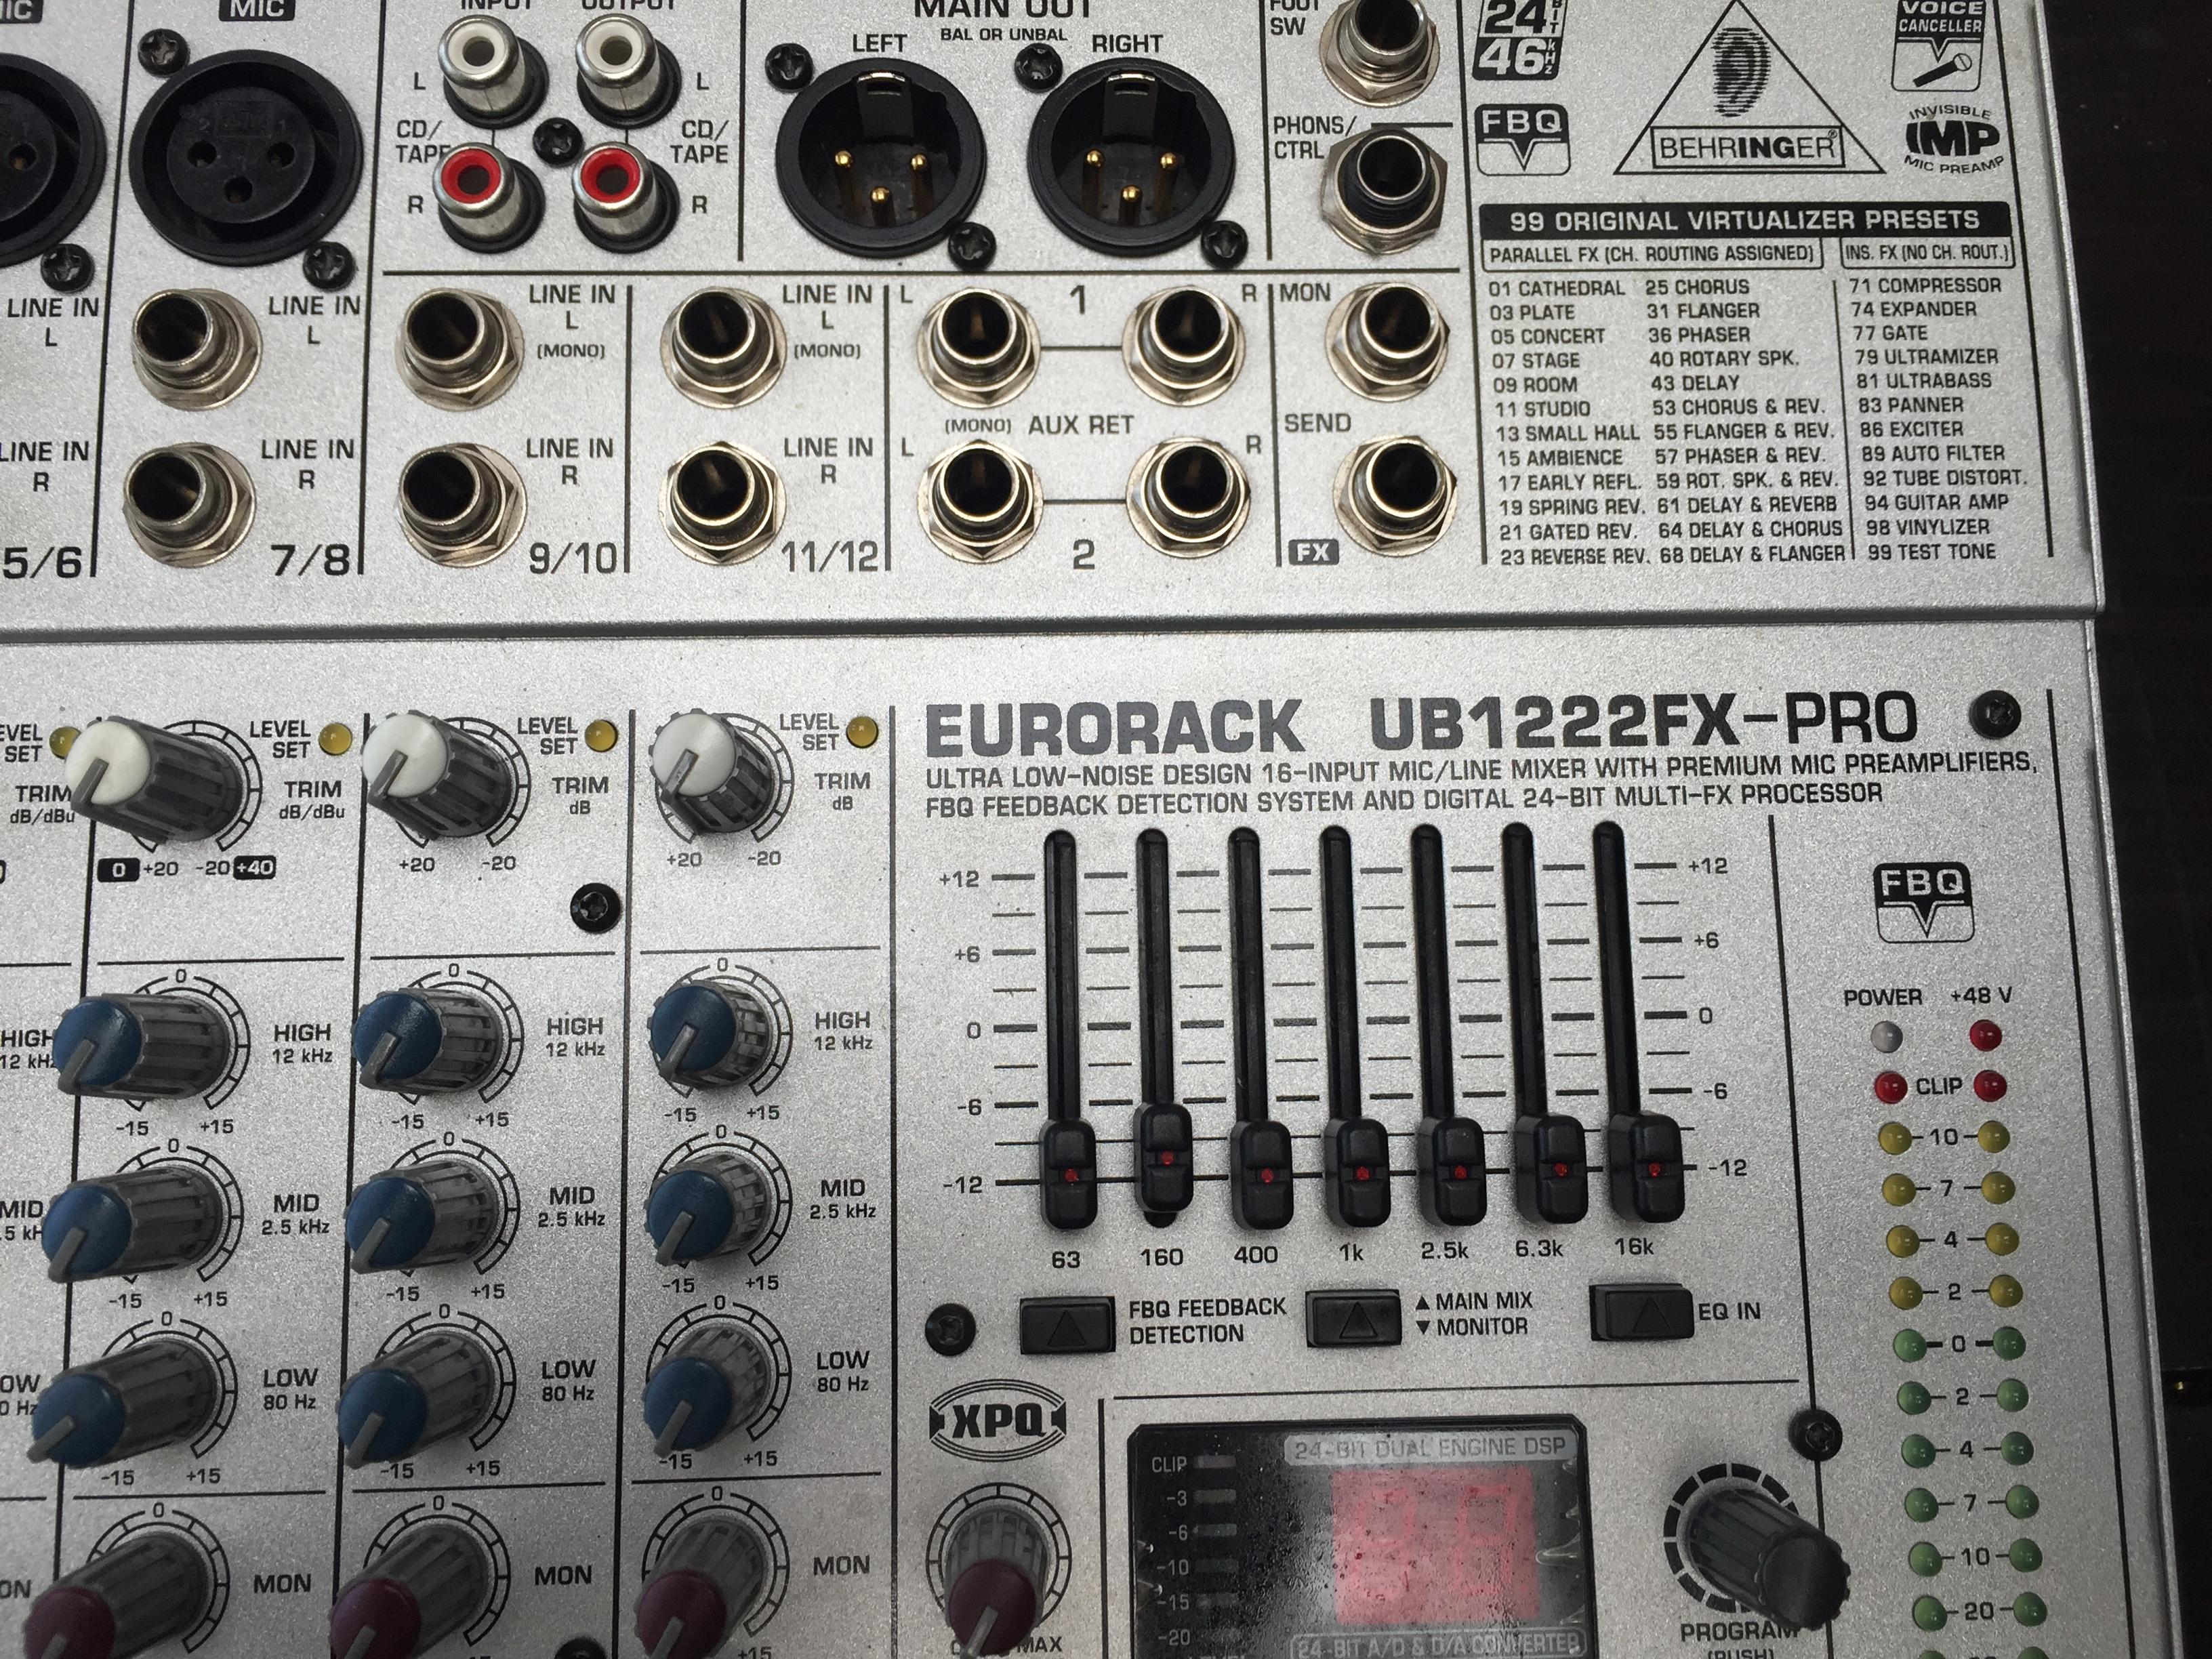 behringer eurorack ub1222fx pro image 1436577 audiofanzine rh en audiofanzine com behringer eurorack ub1222fx-pro user manual behringer eurorack ub1222fx-pro mixer price